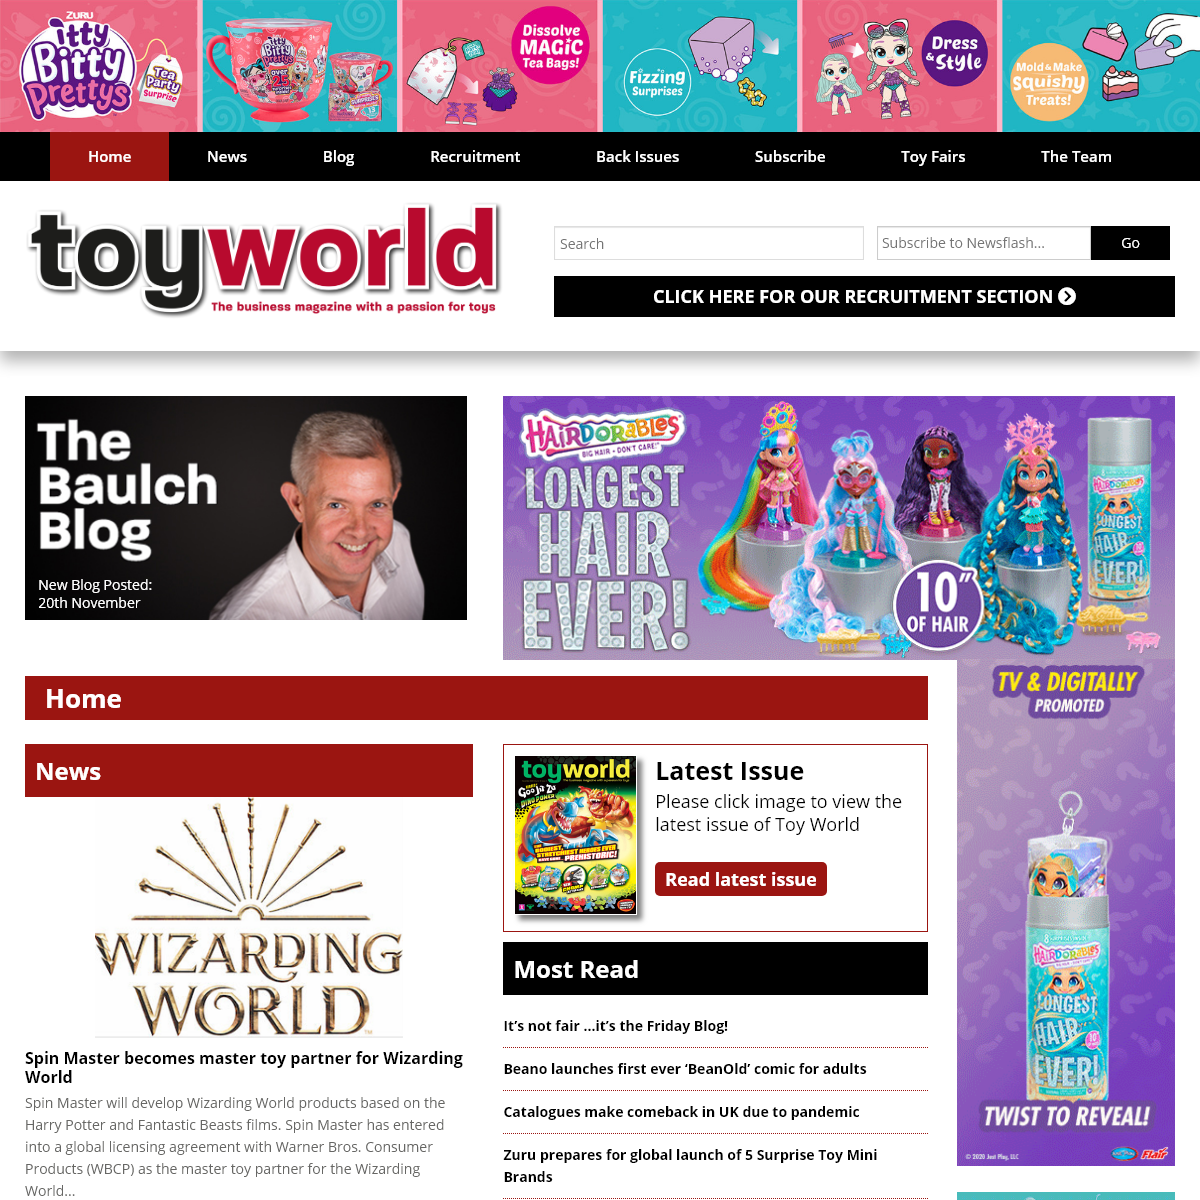 Toy World Magazine - The business magazine with a passion for toysToy World Magazine - The business magazine with a passion for